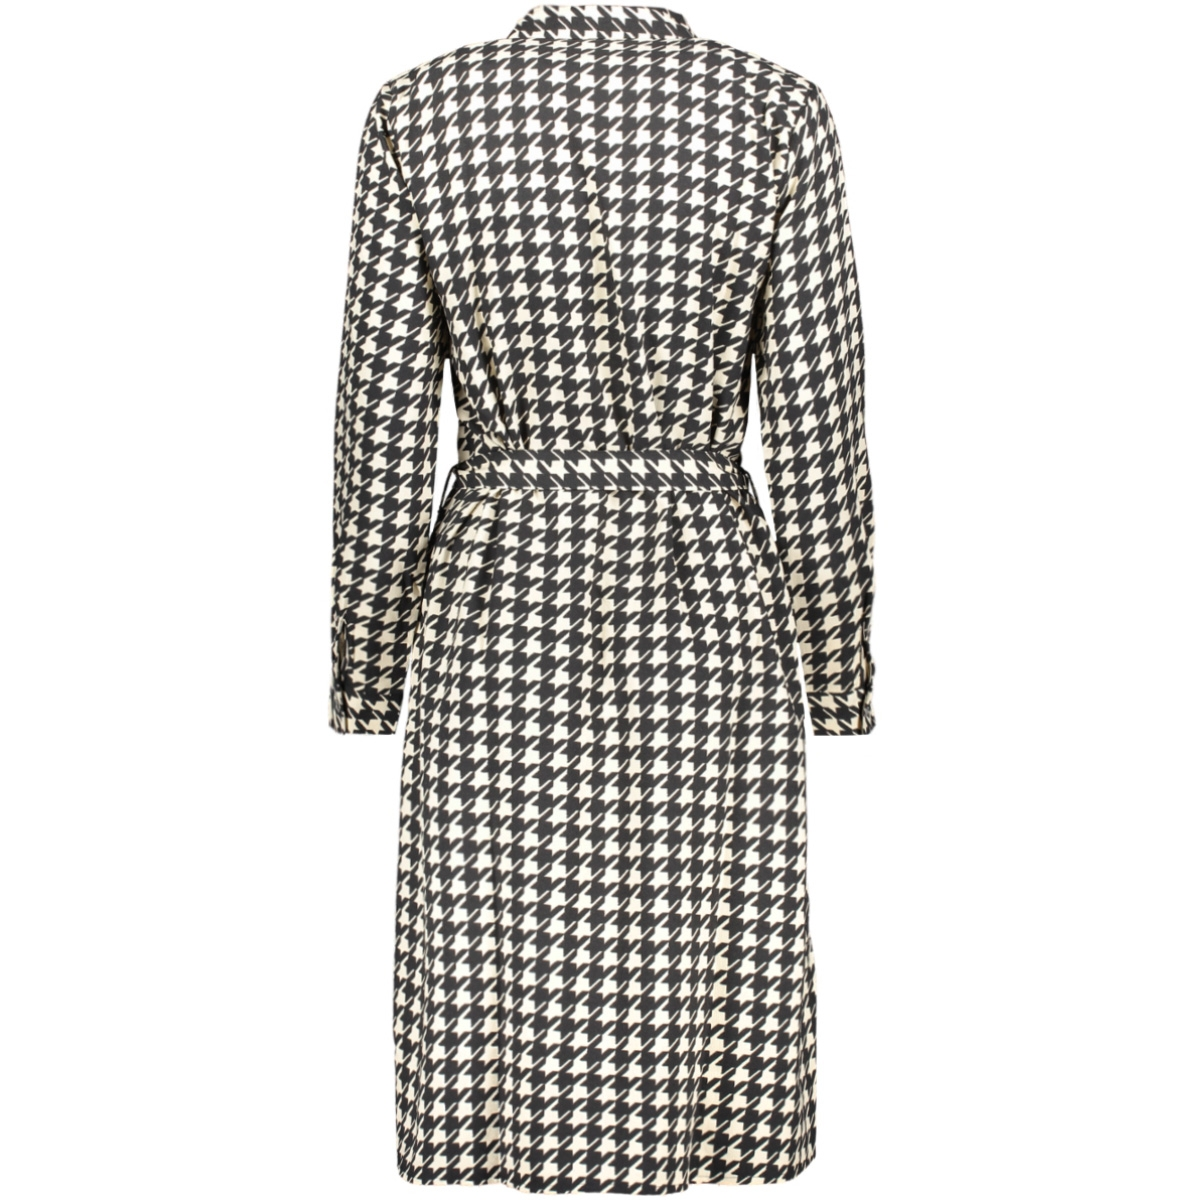 jdynoon l/s dress wvn 15184517 jacqueline de yong jurk black/sandshell